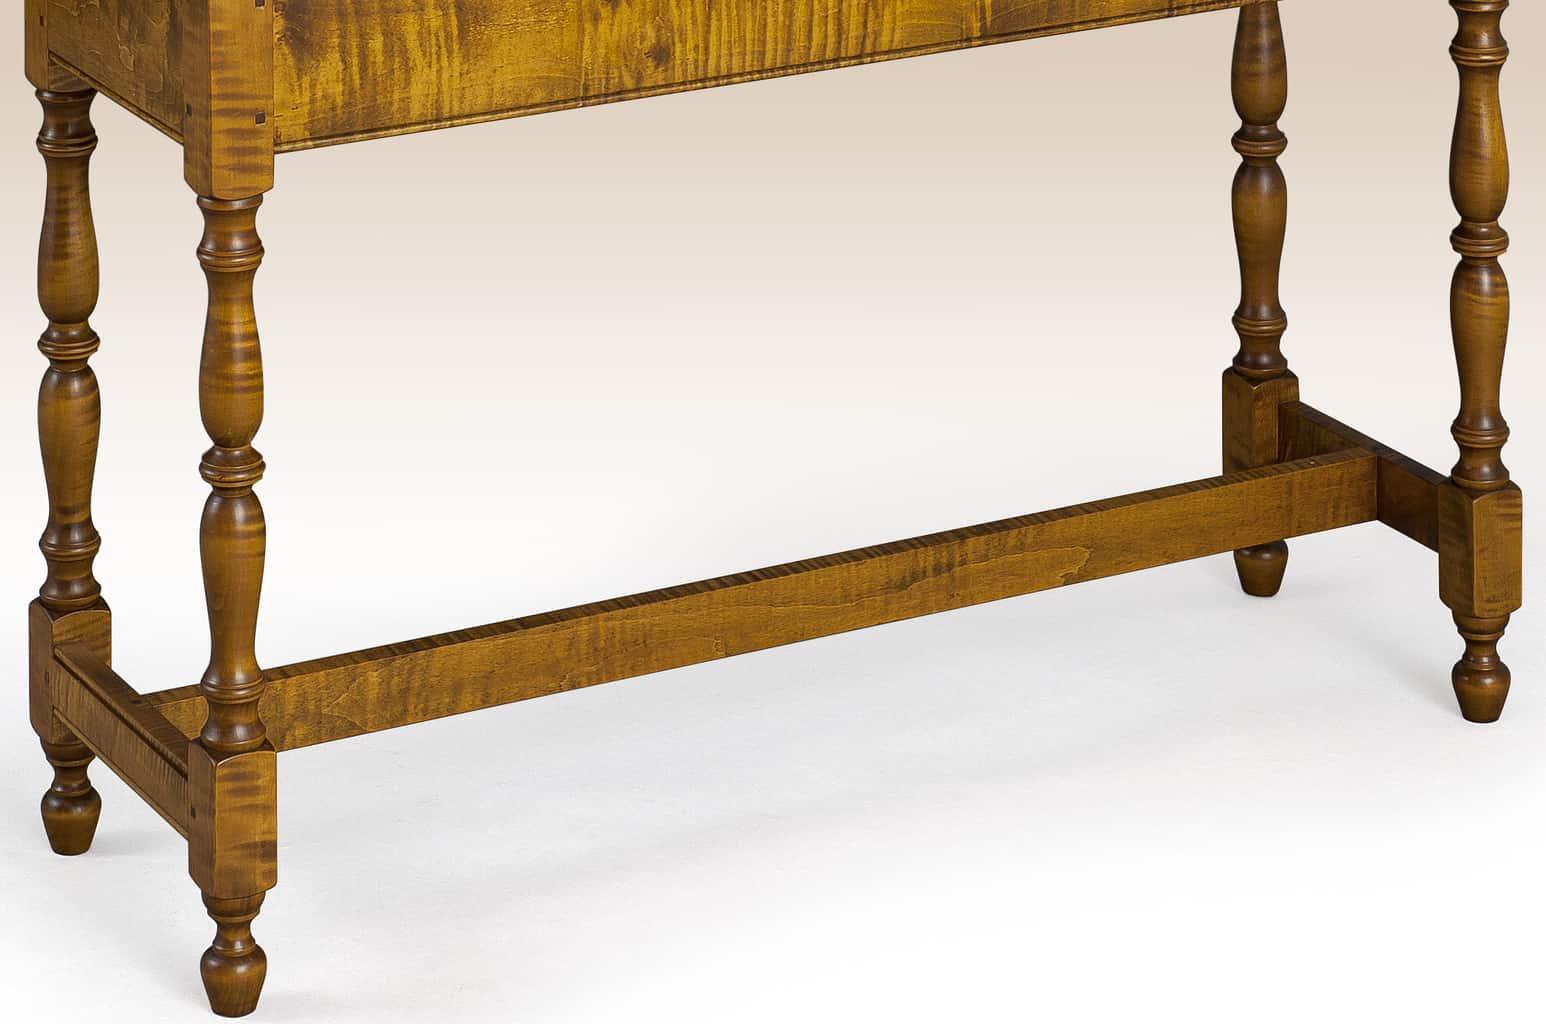 Historical Chatham Stretcher Base Sofa Table